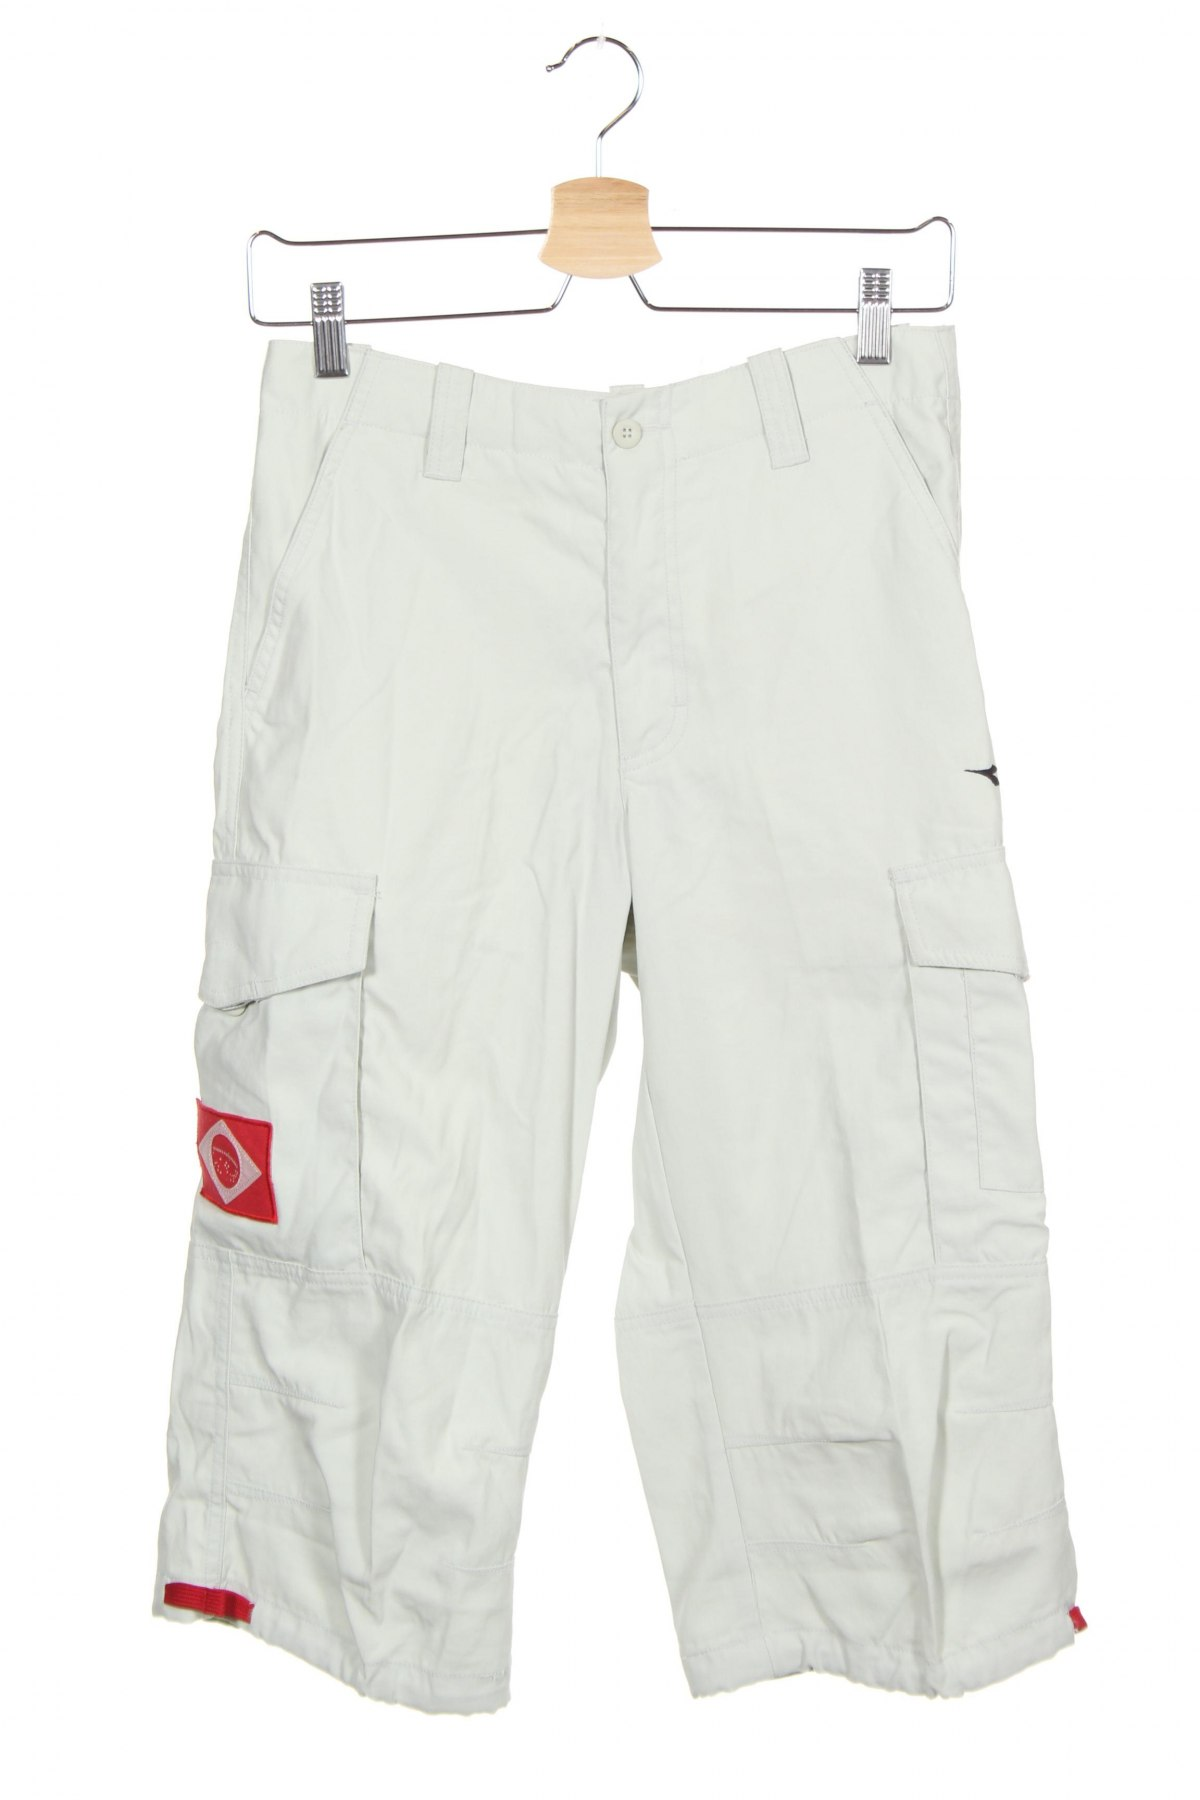 Мъжки спортен панталон Diadora, Размер S, Цвят Сив, Полиамид, Цена 14,70лв.